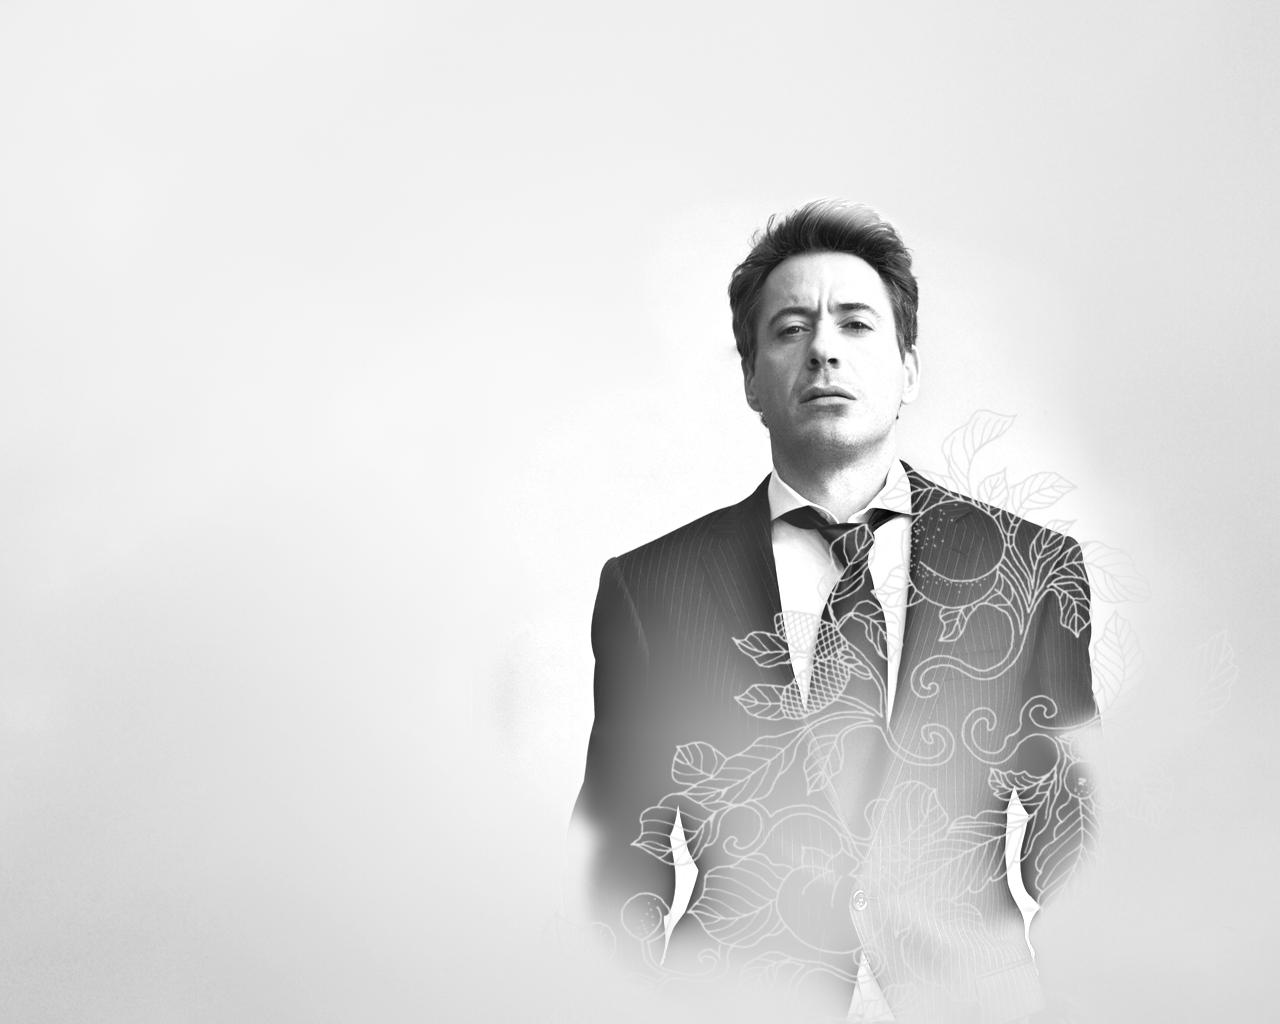 Robert Downey Jr Photoshoot Black And White